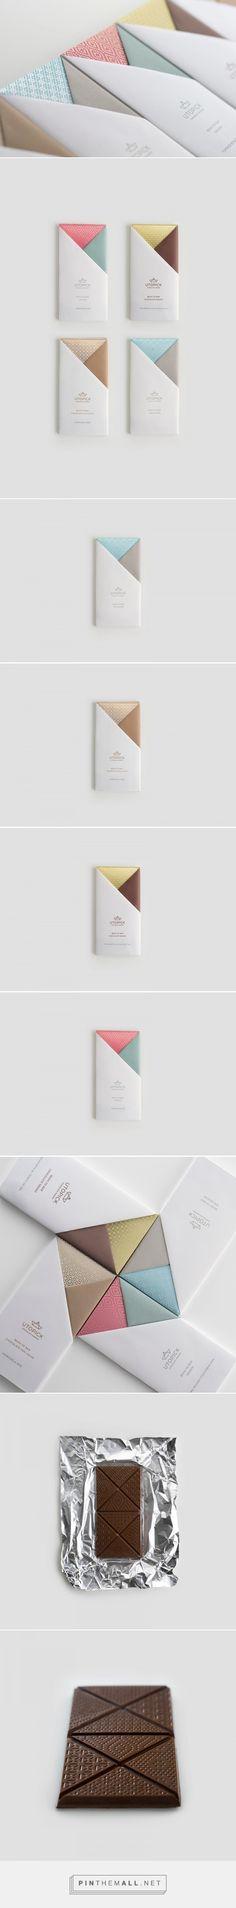 Utopick Chocolates packaging design by Lavernia & Cienfuegos / packaging design / brand package / design inspiration / branding / дизайн упаковки Web Design, Label Design, Branding Design, Packaging Design Inspiration, Graphic Design Inspiration, Brand Packaging, Gift Packaging, Packaging Ideas, Design Packaging